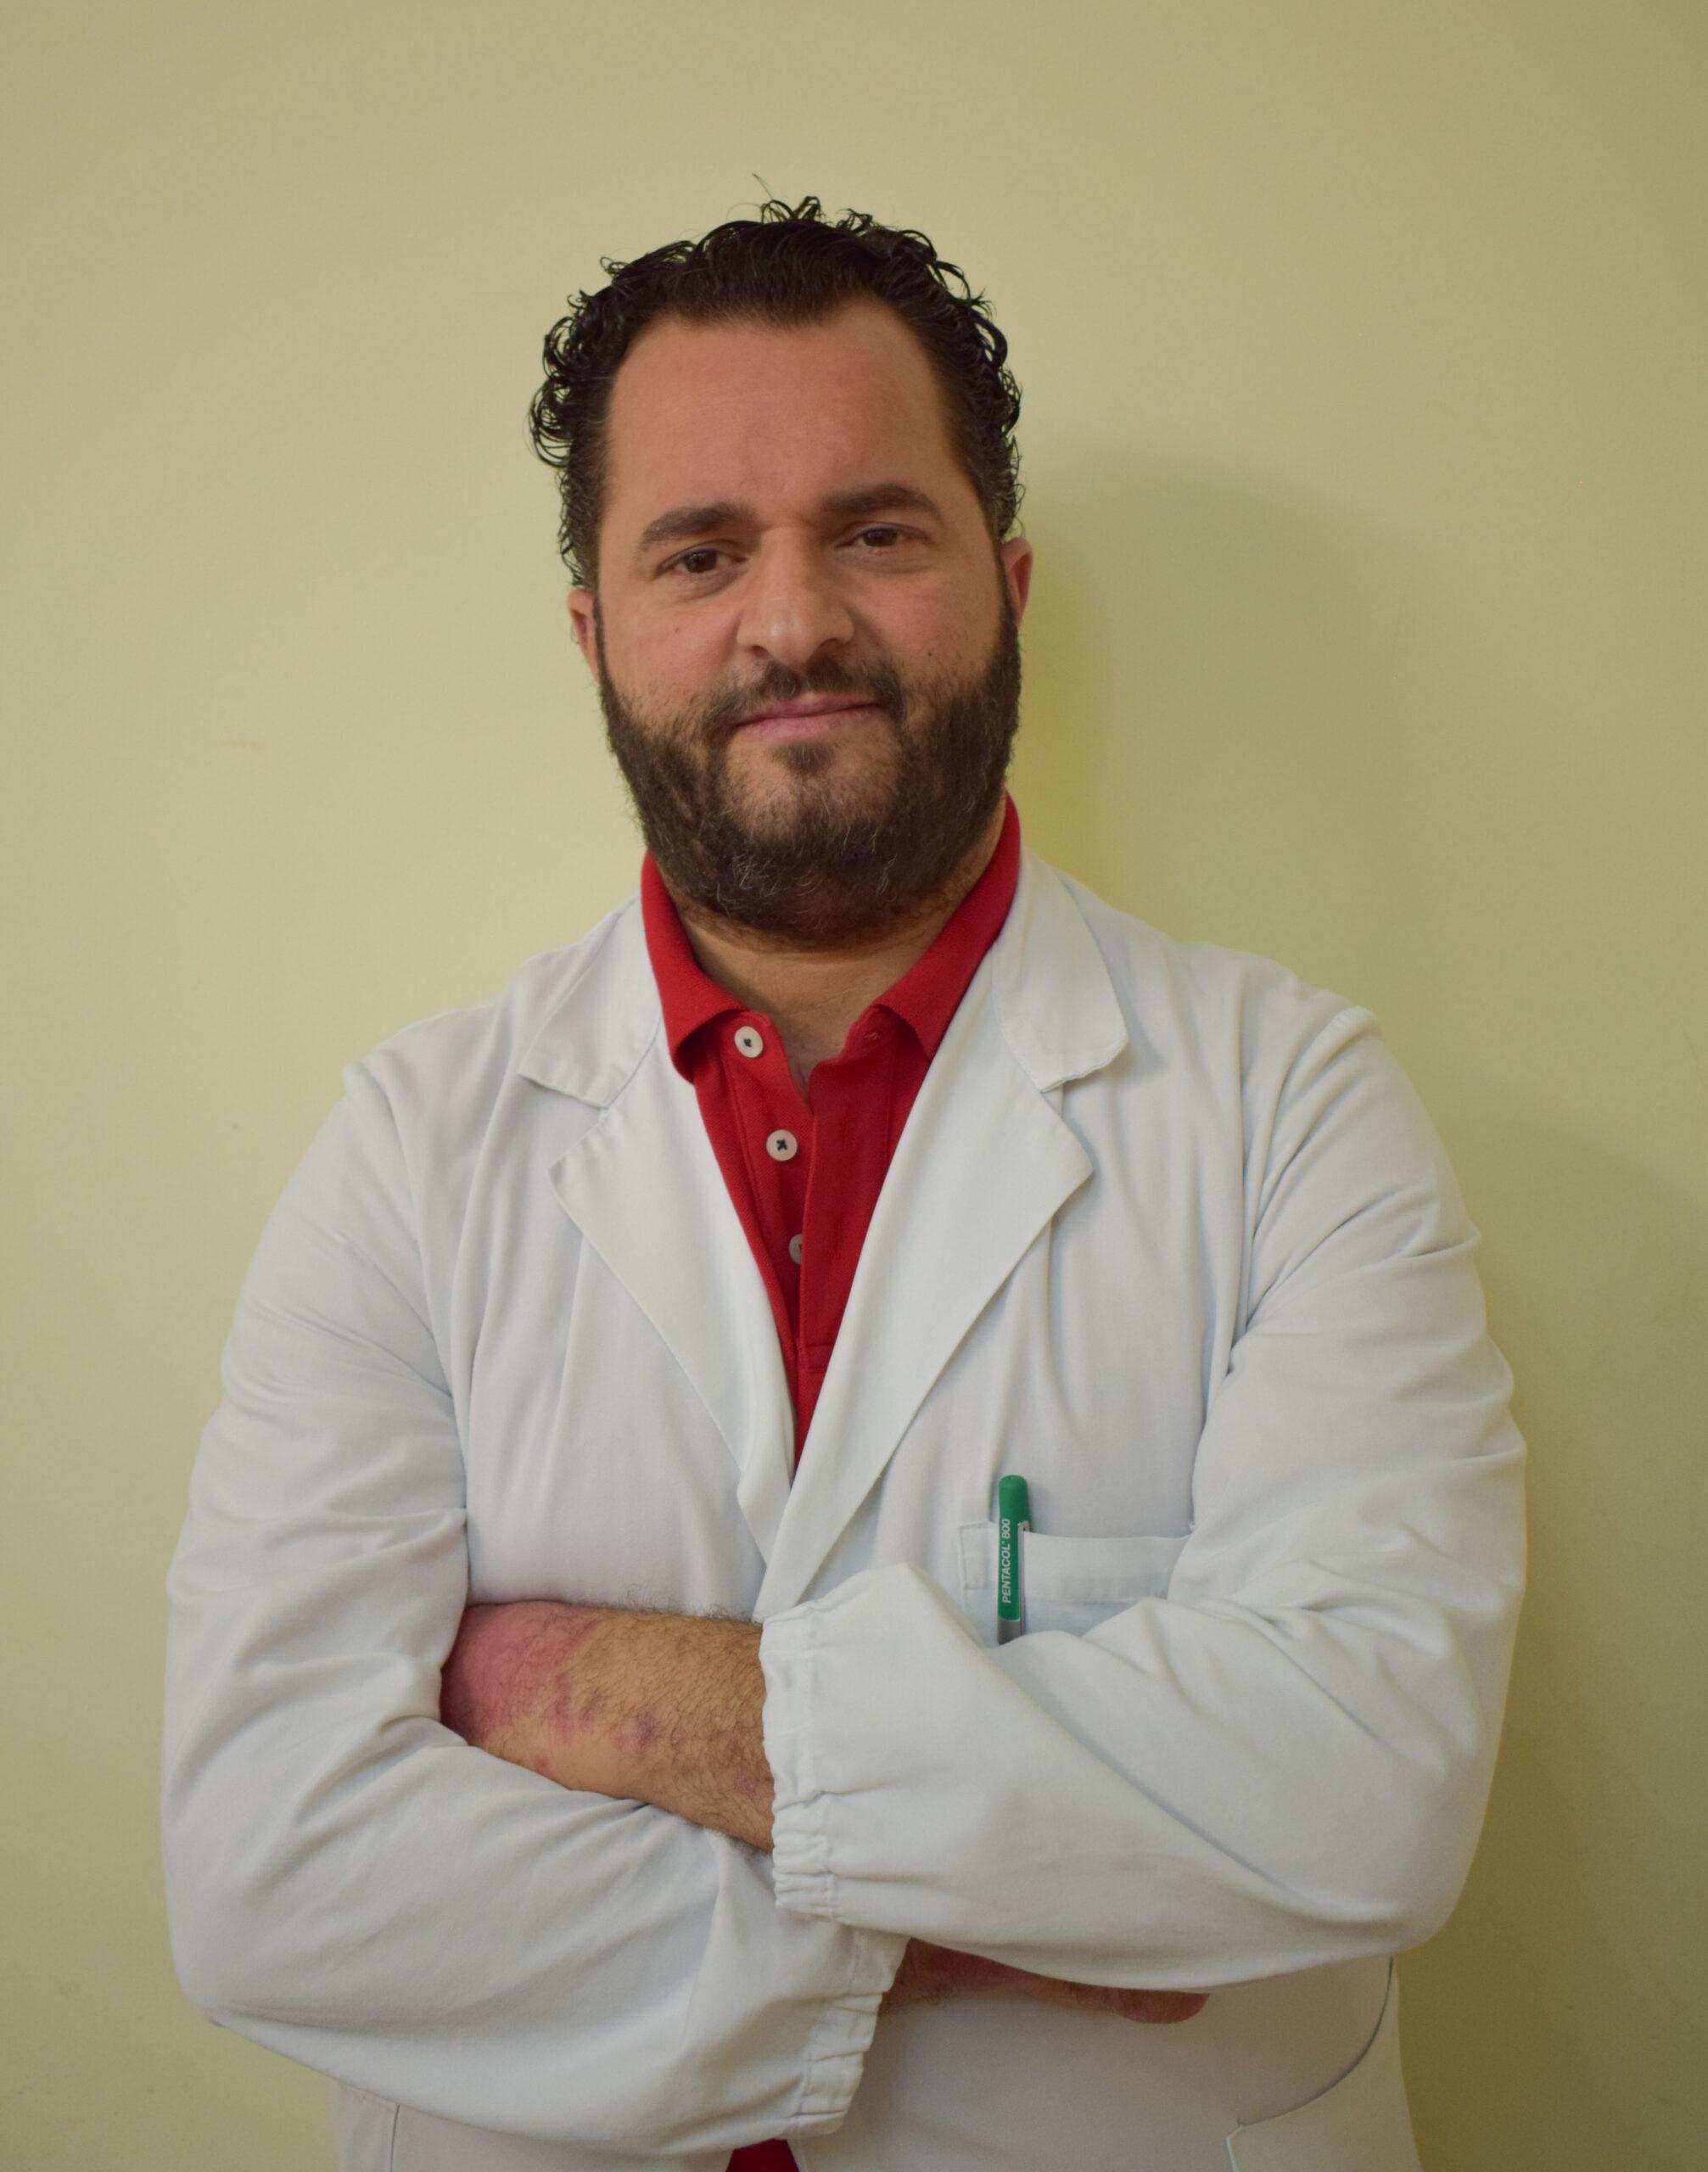 Dott. Alber Jiryis